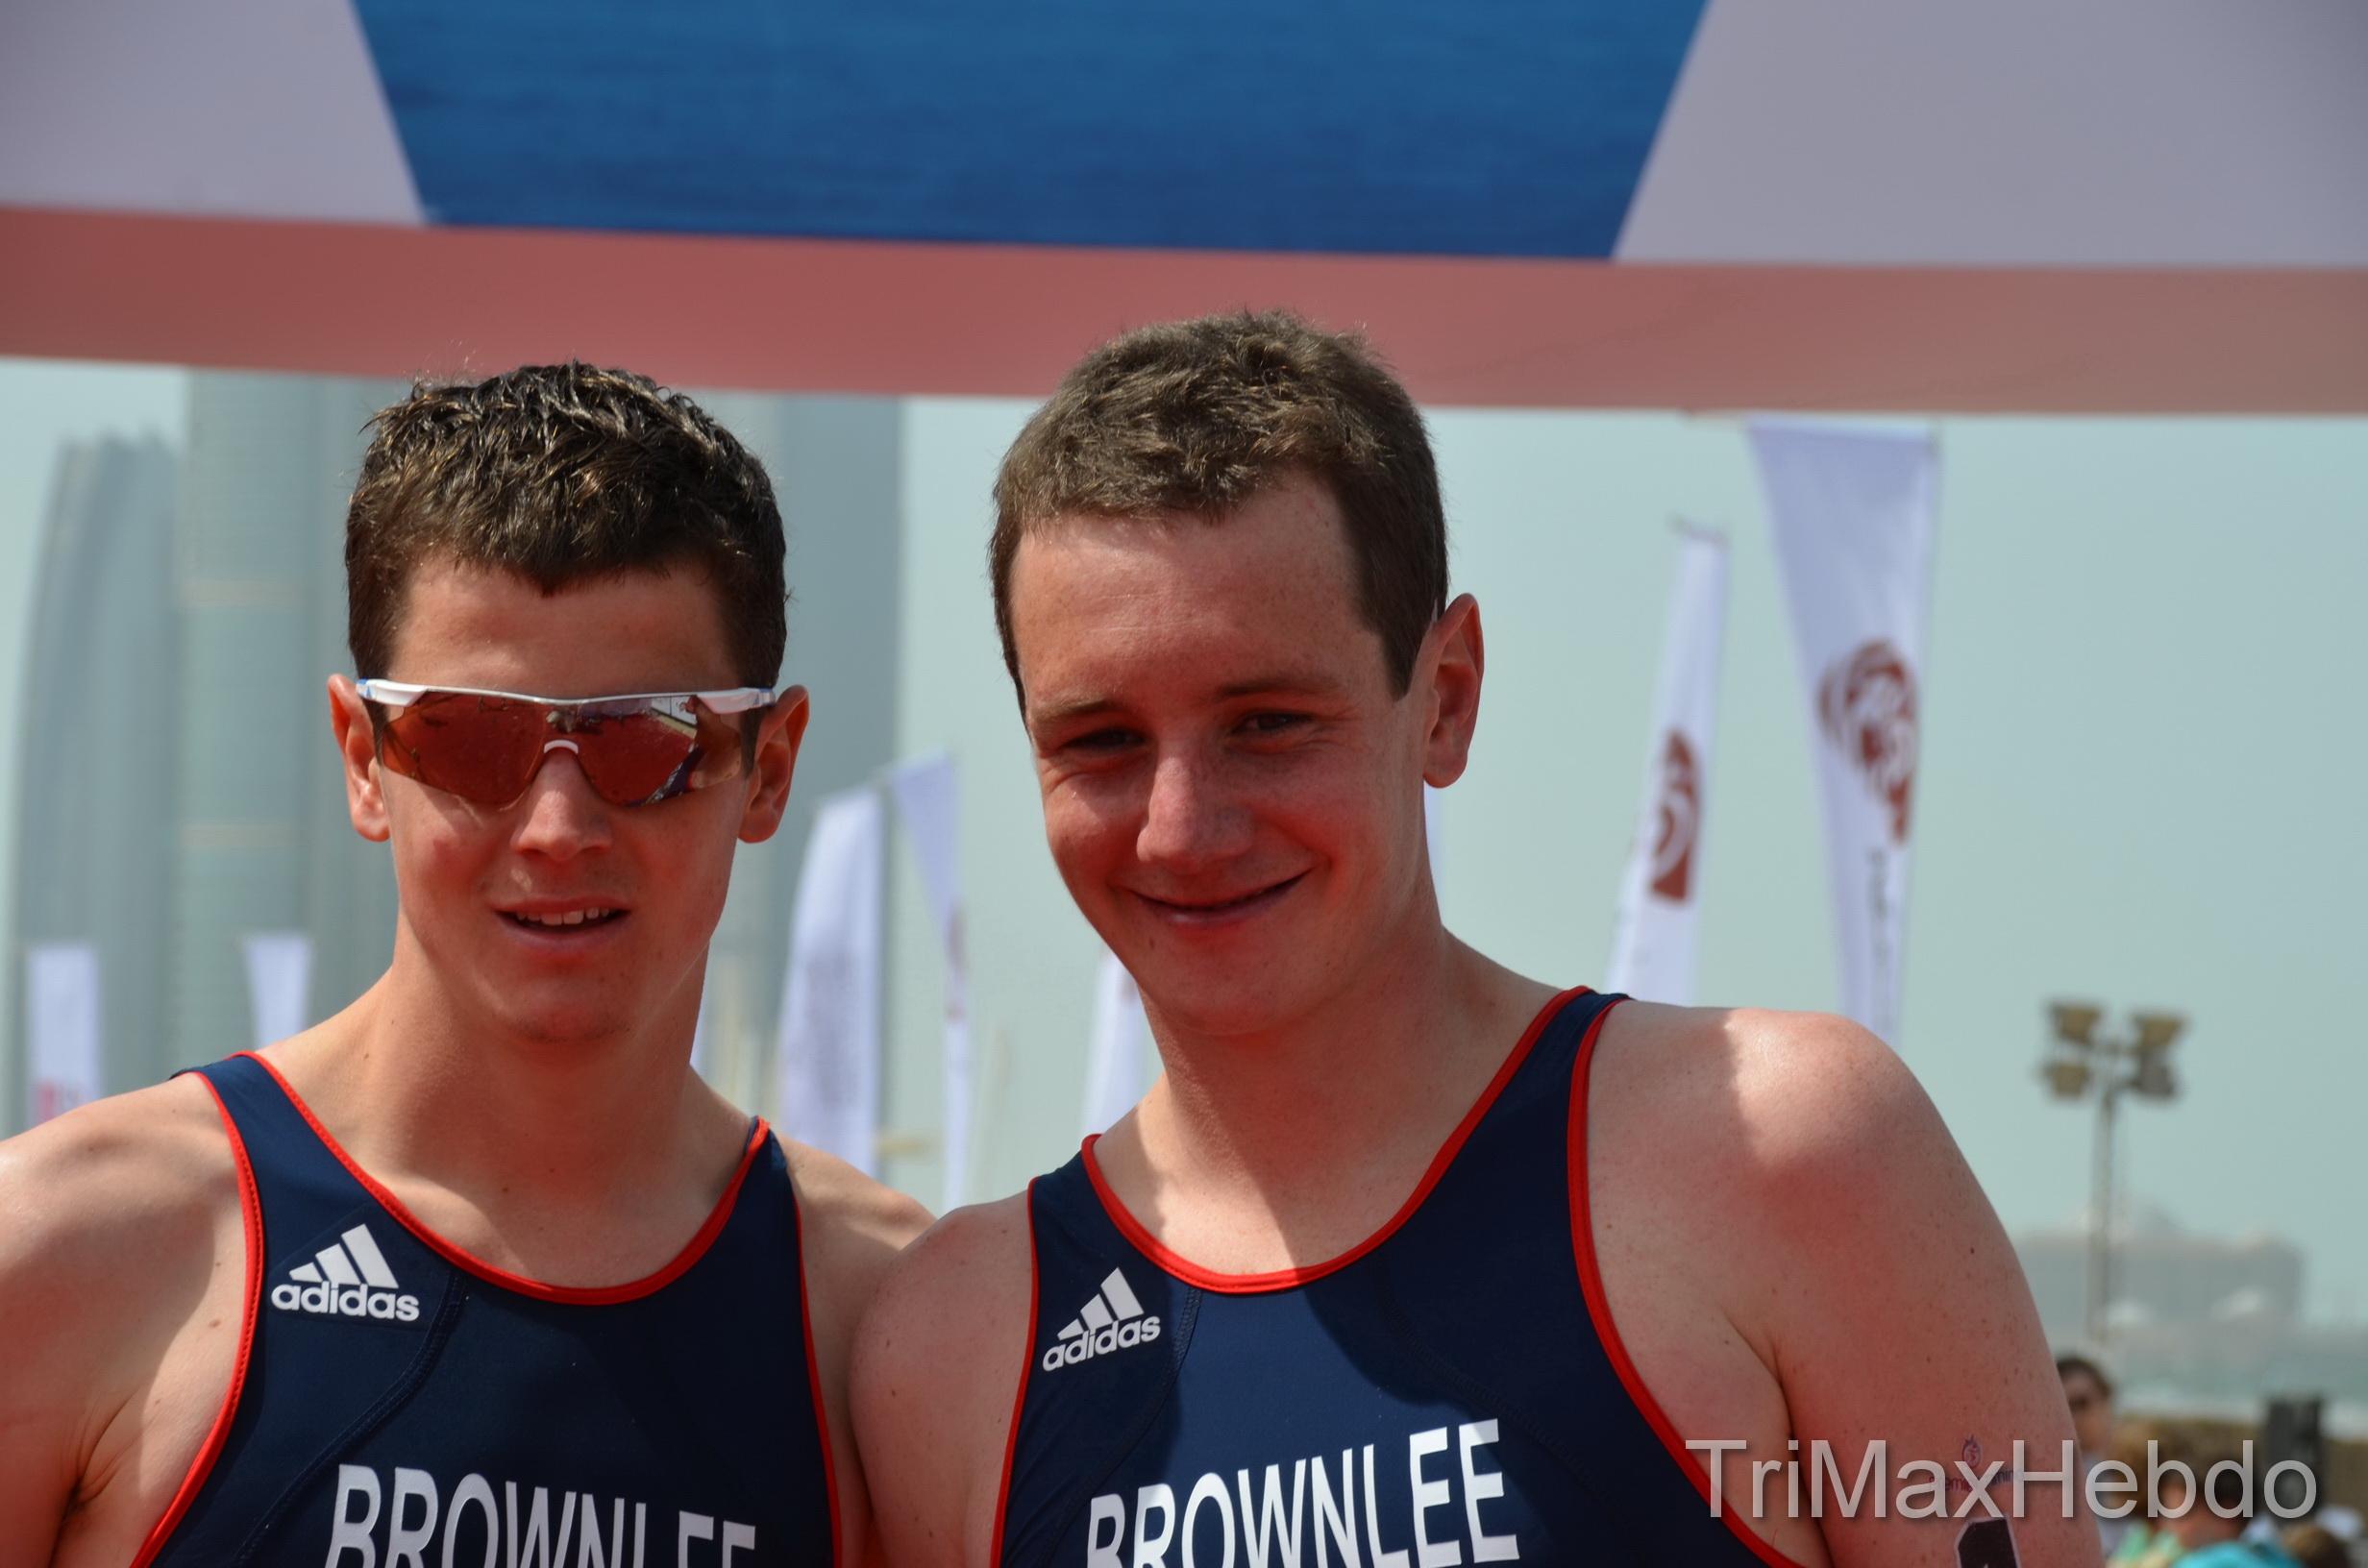 Les frères Bronwlee en promenade à Abu Dhabi…